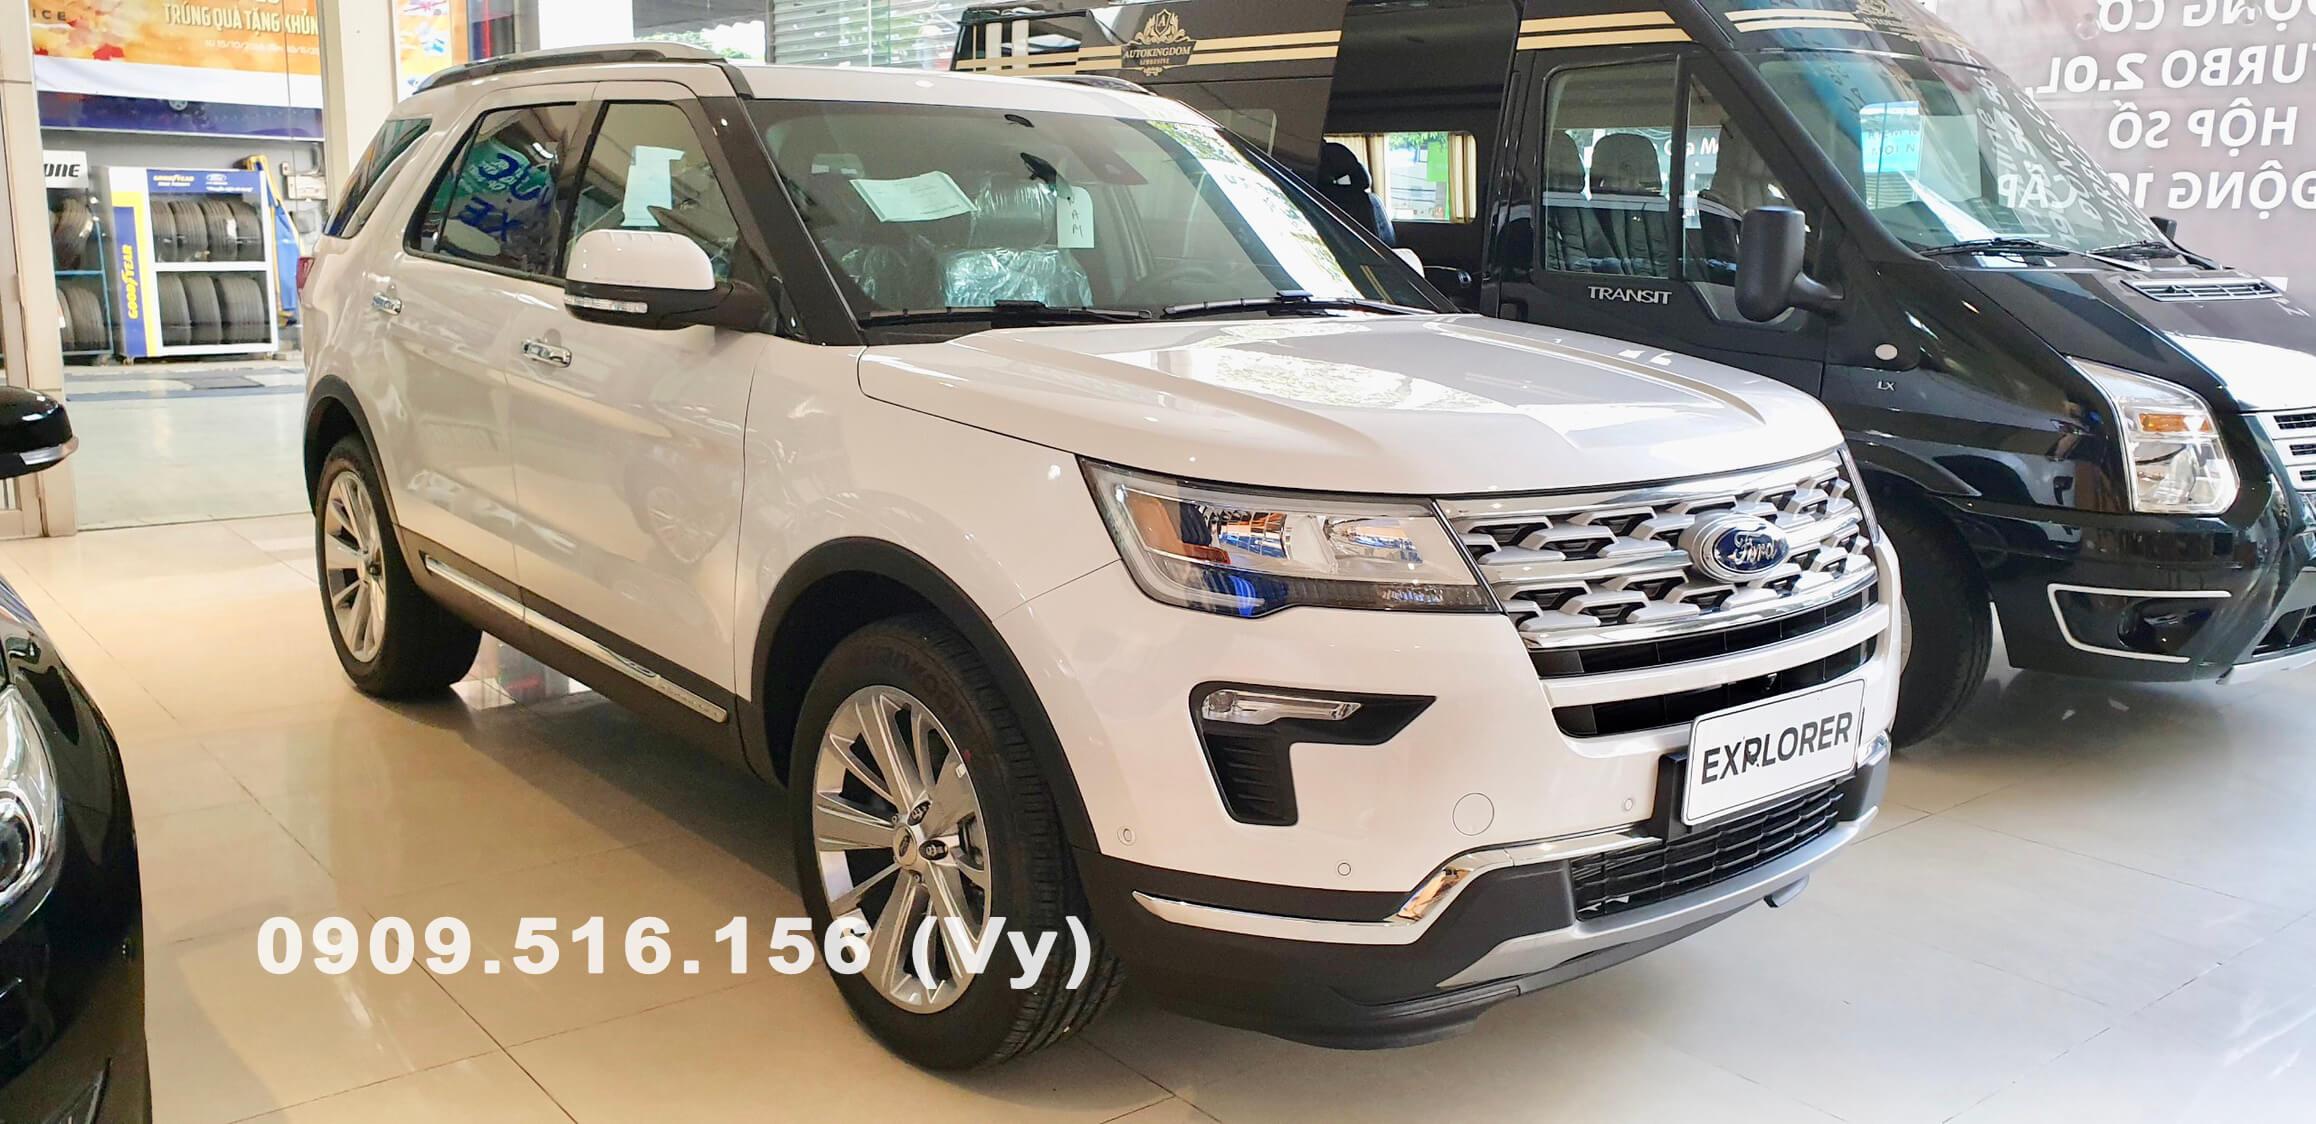 gia-xe-ford-explorer-2019-muaxegiatot-vn-2